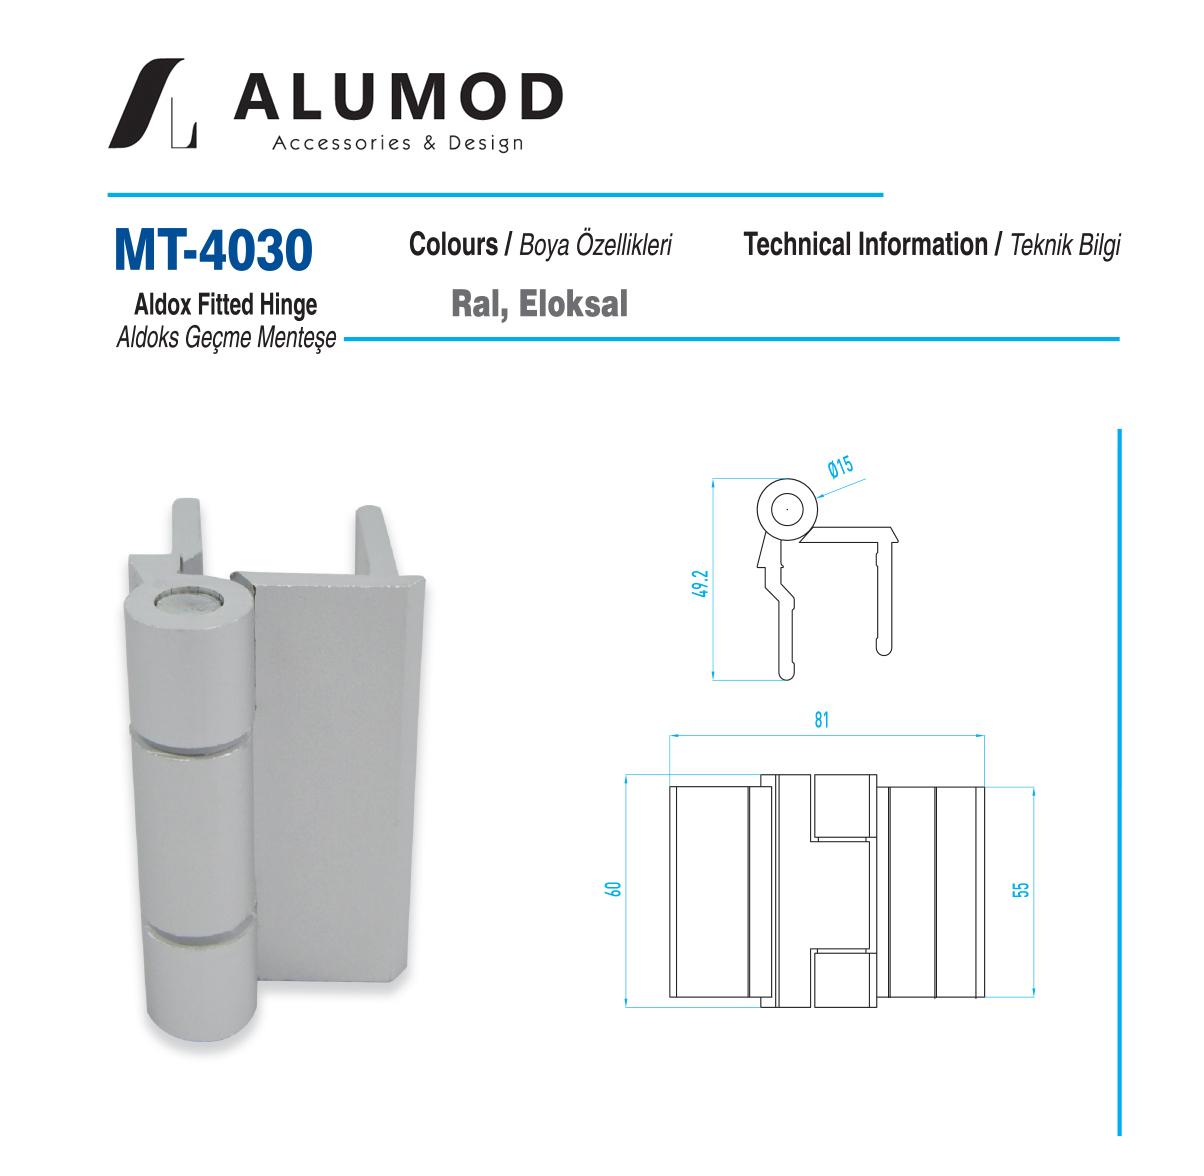 MT-4030 Aldoks Geçme Menteşe